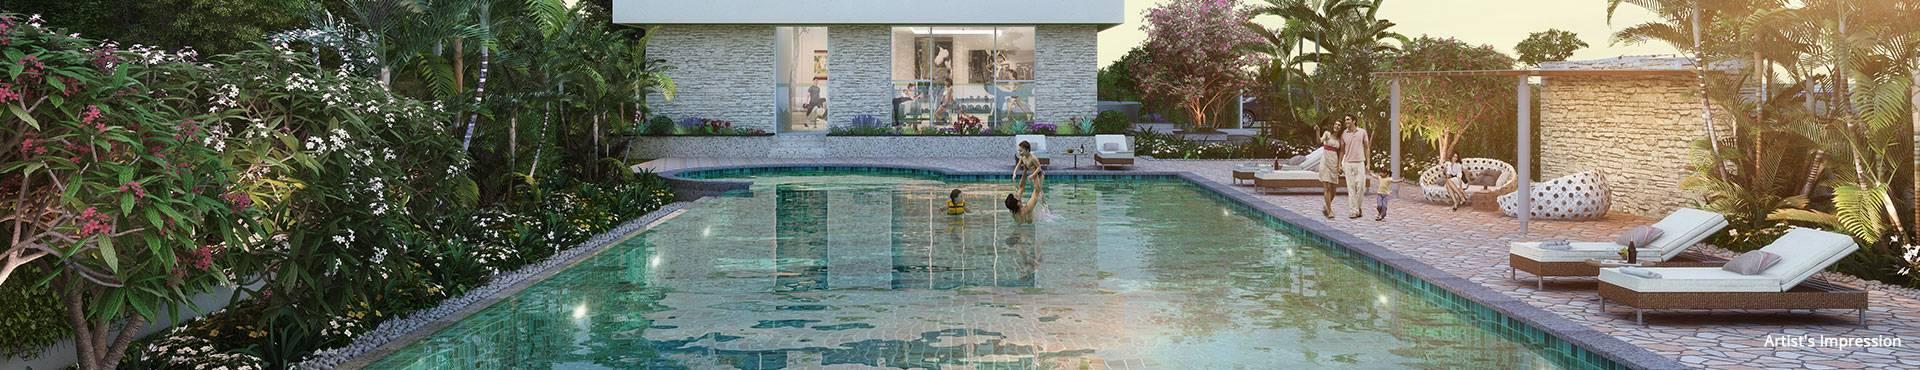 Life Republic ORO AVENUE PUNE Swimming Pool